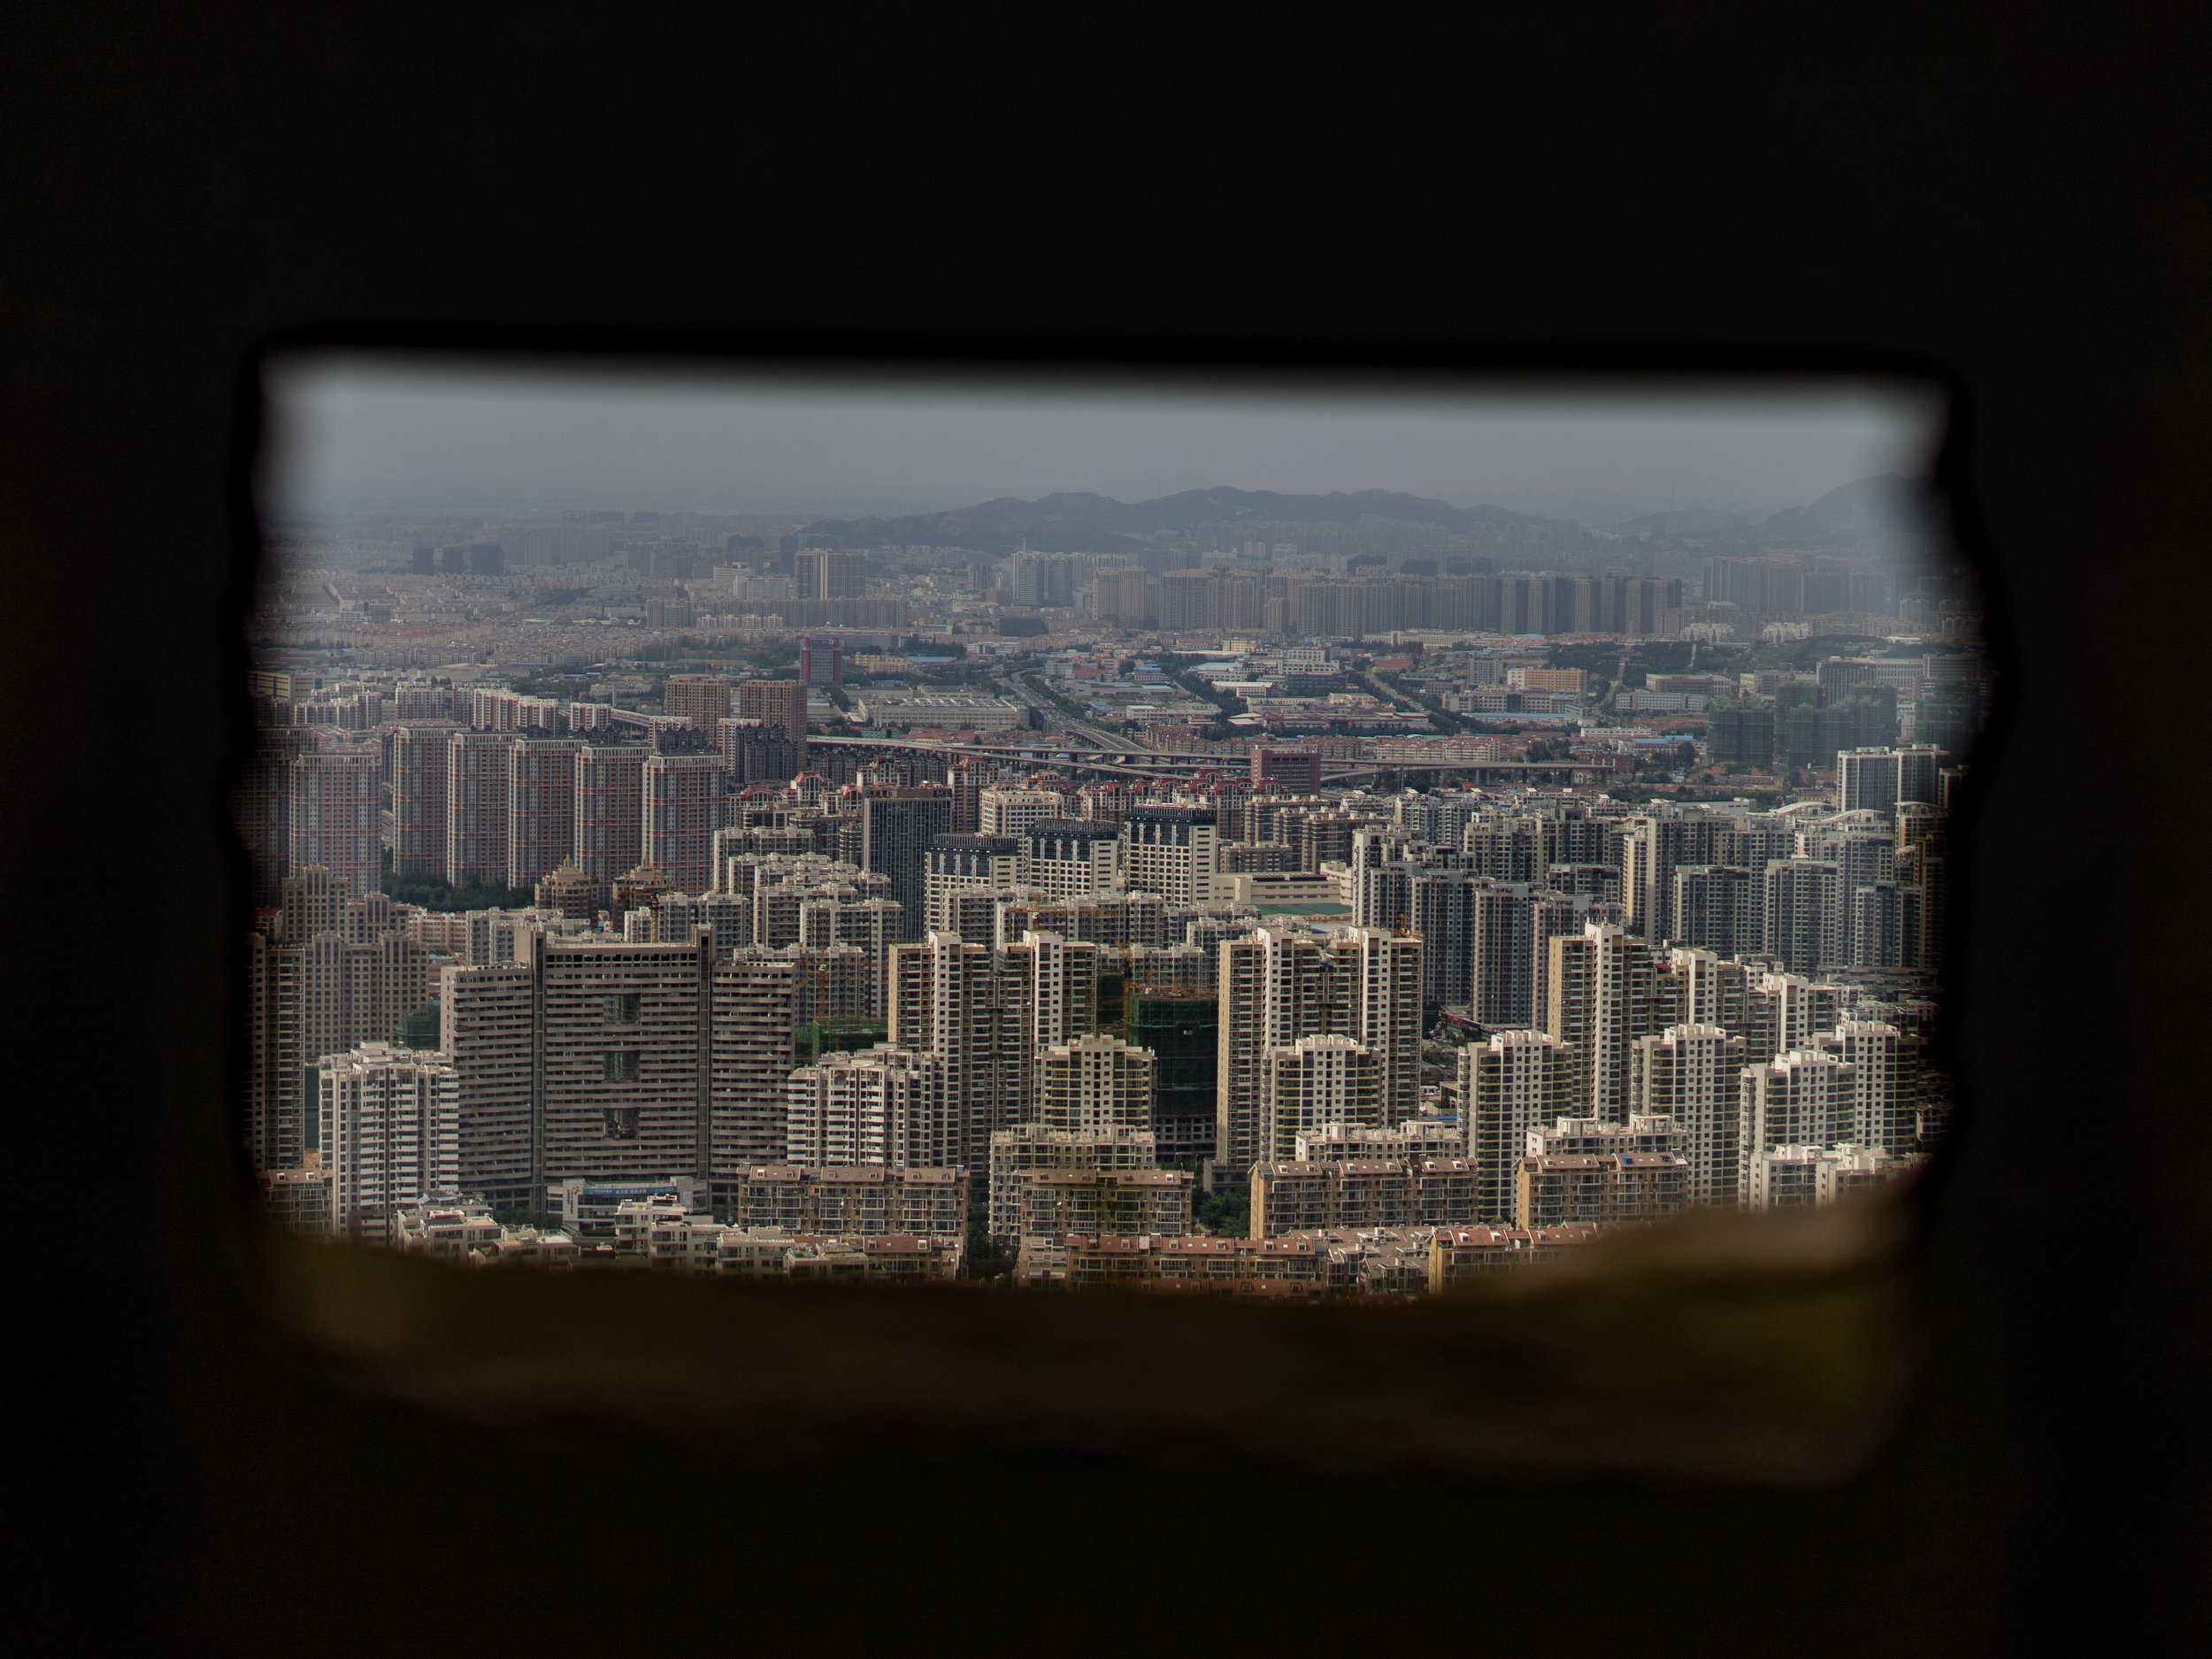 looking through to Qingdao, China